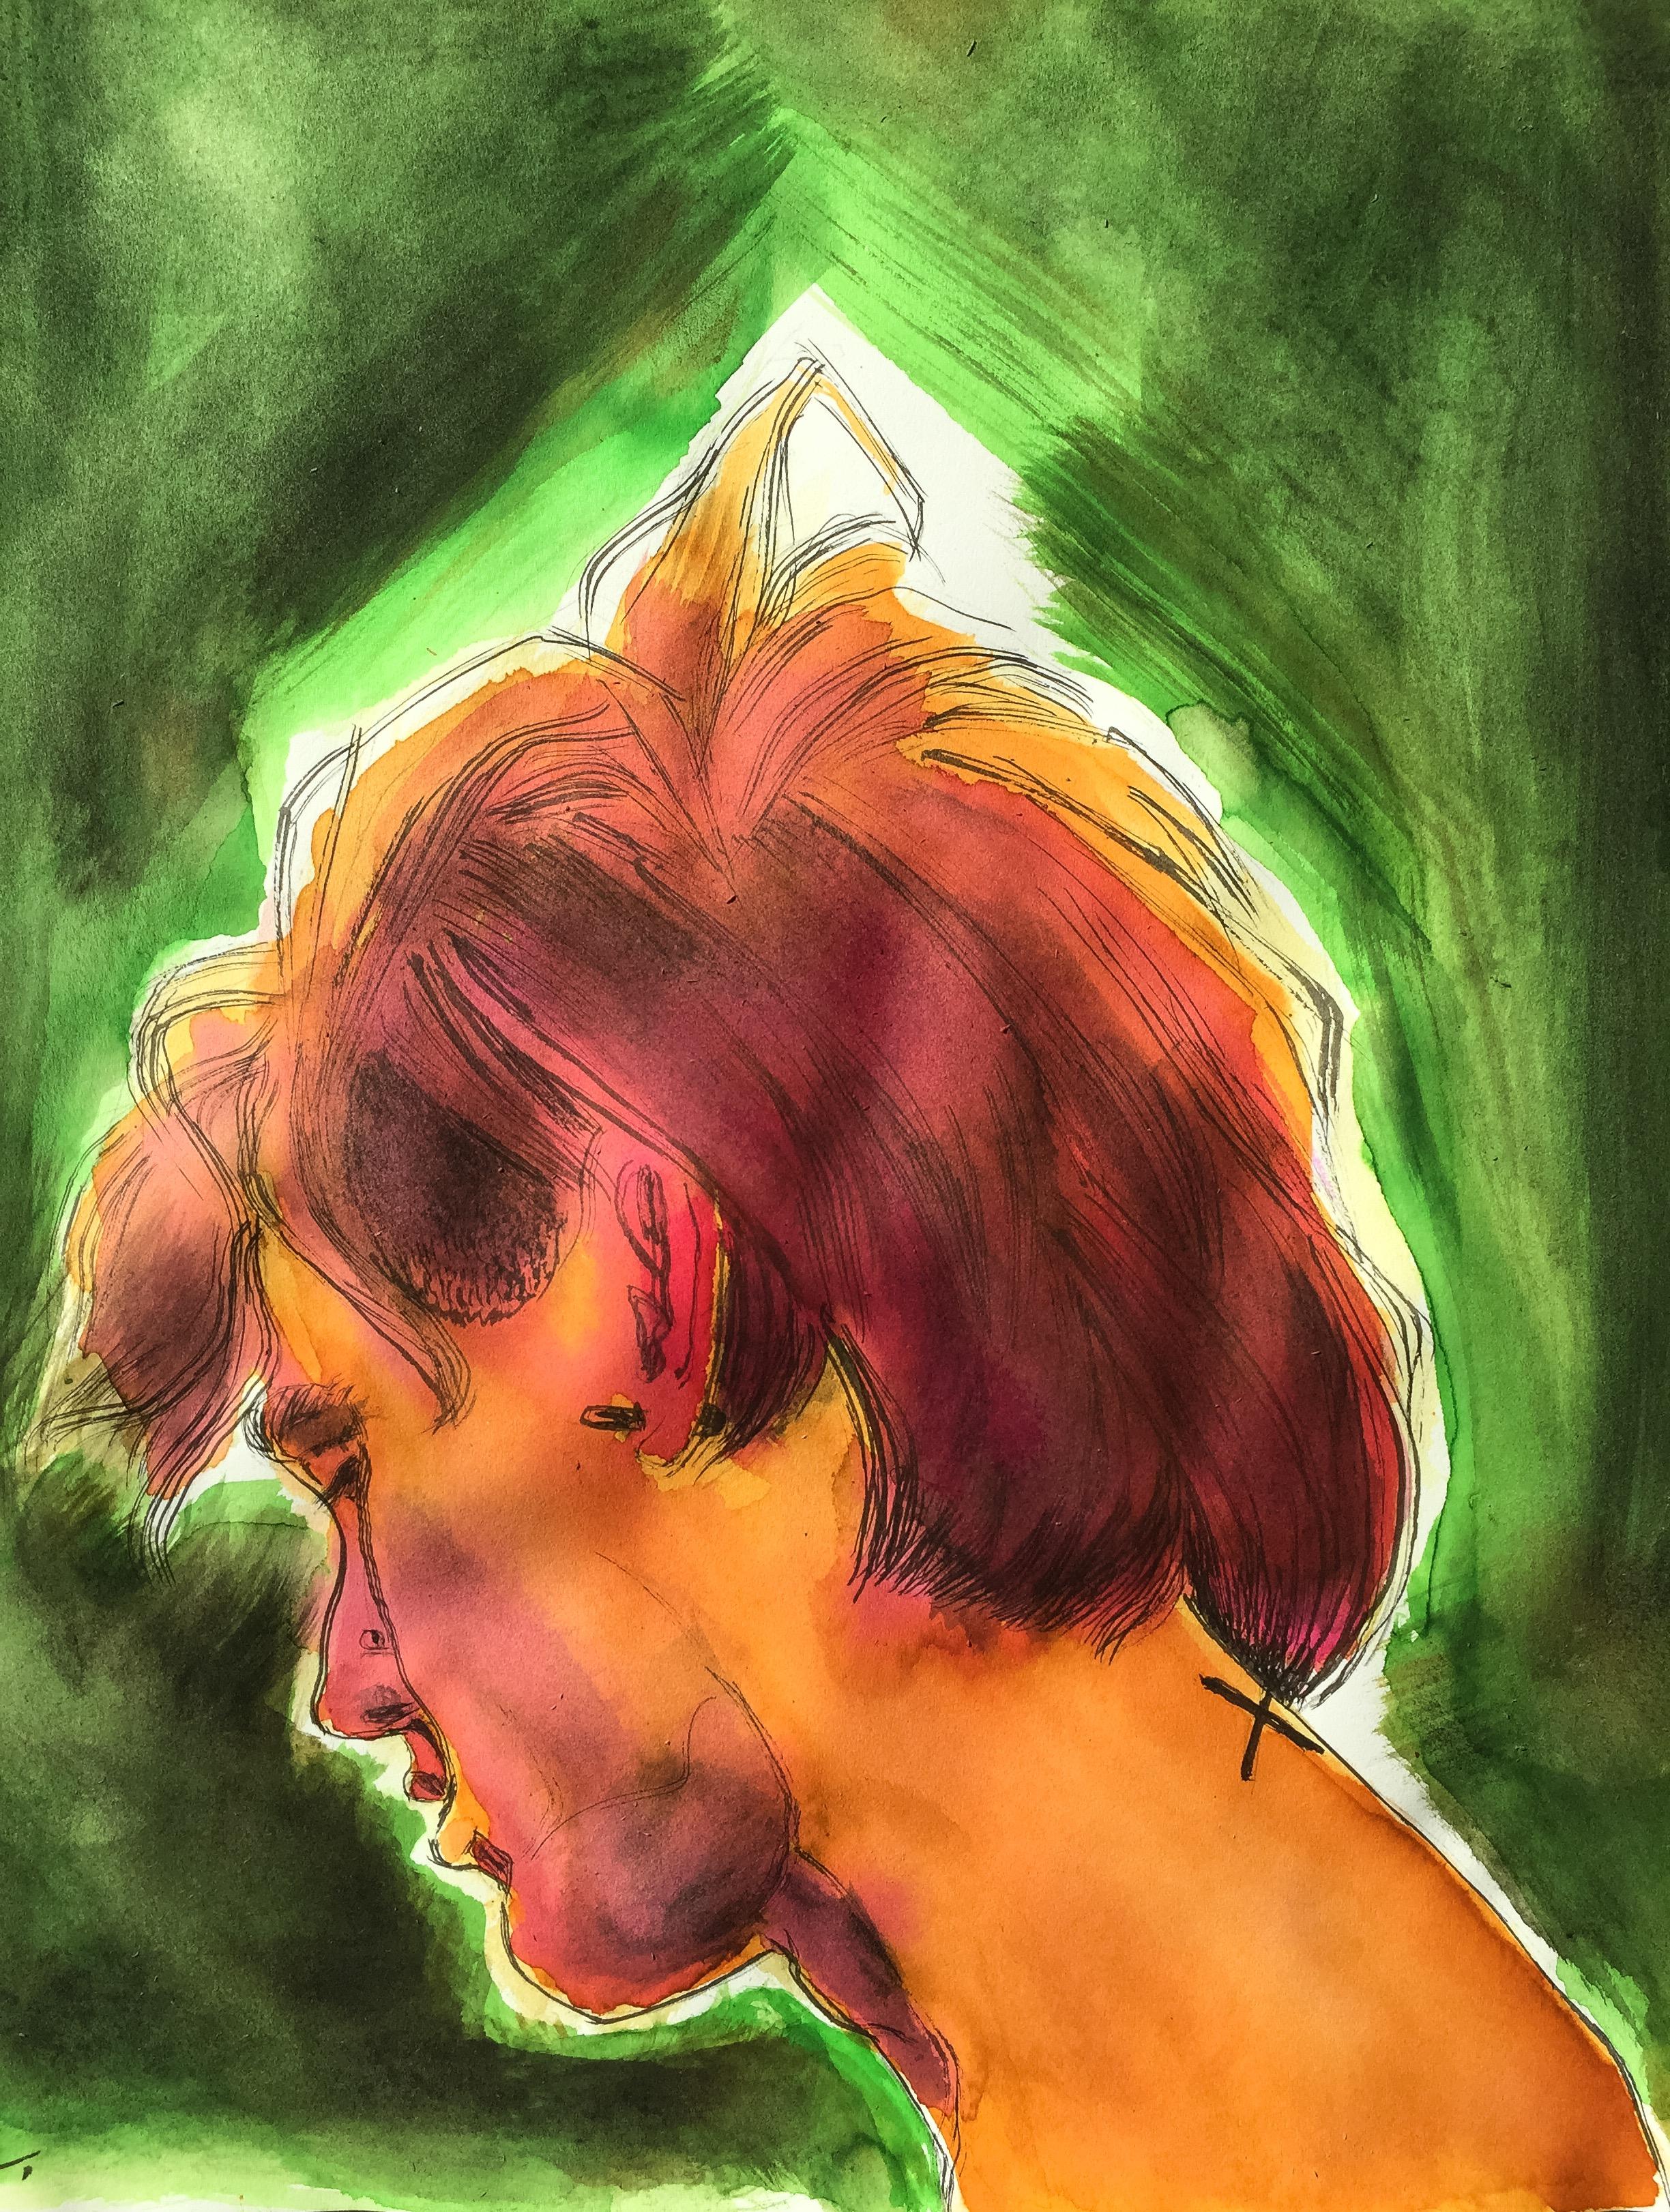 """Man Profiled X"" by Richard Vyse"